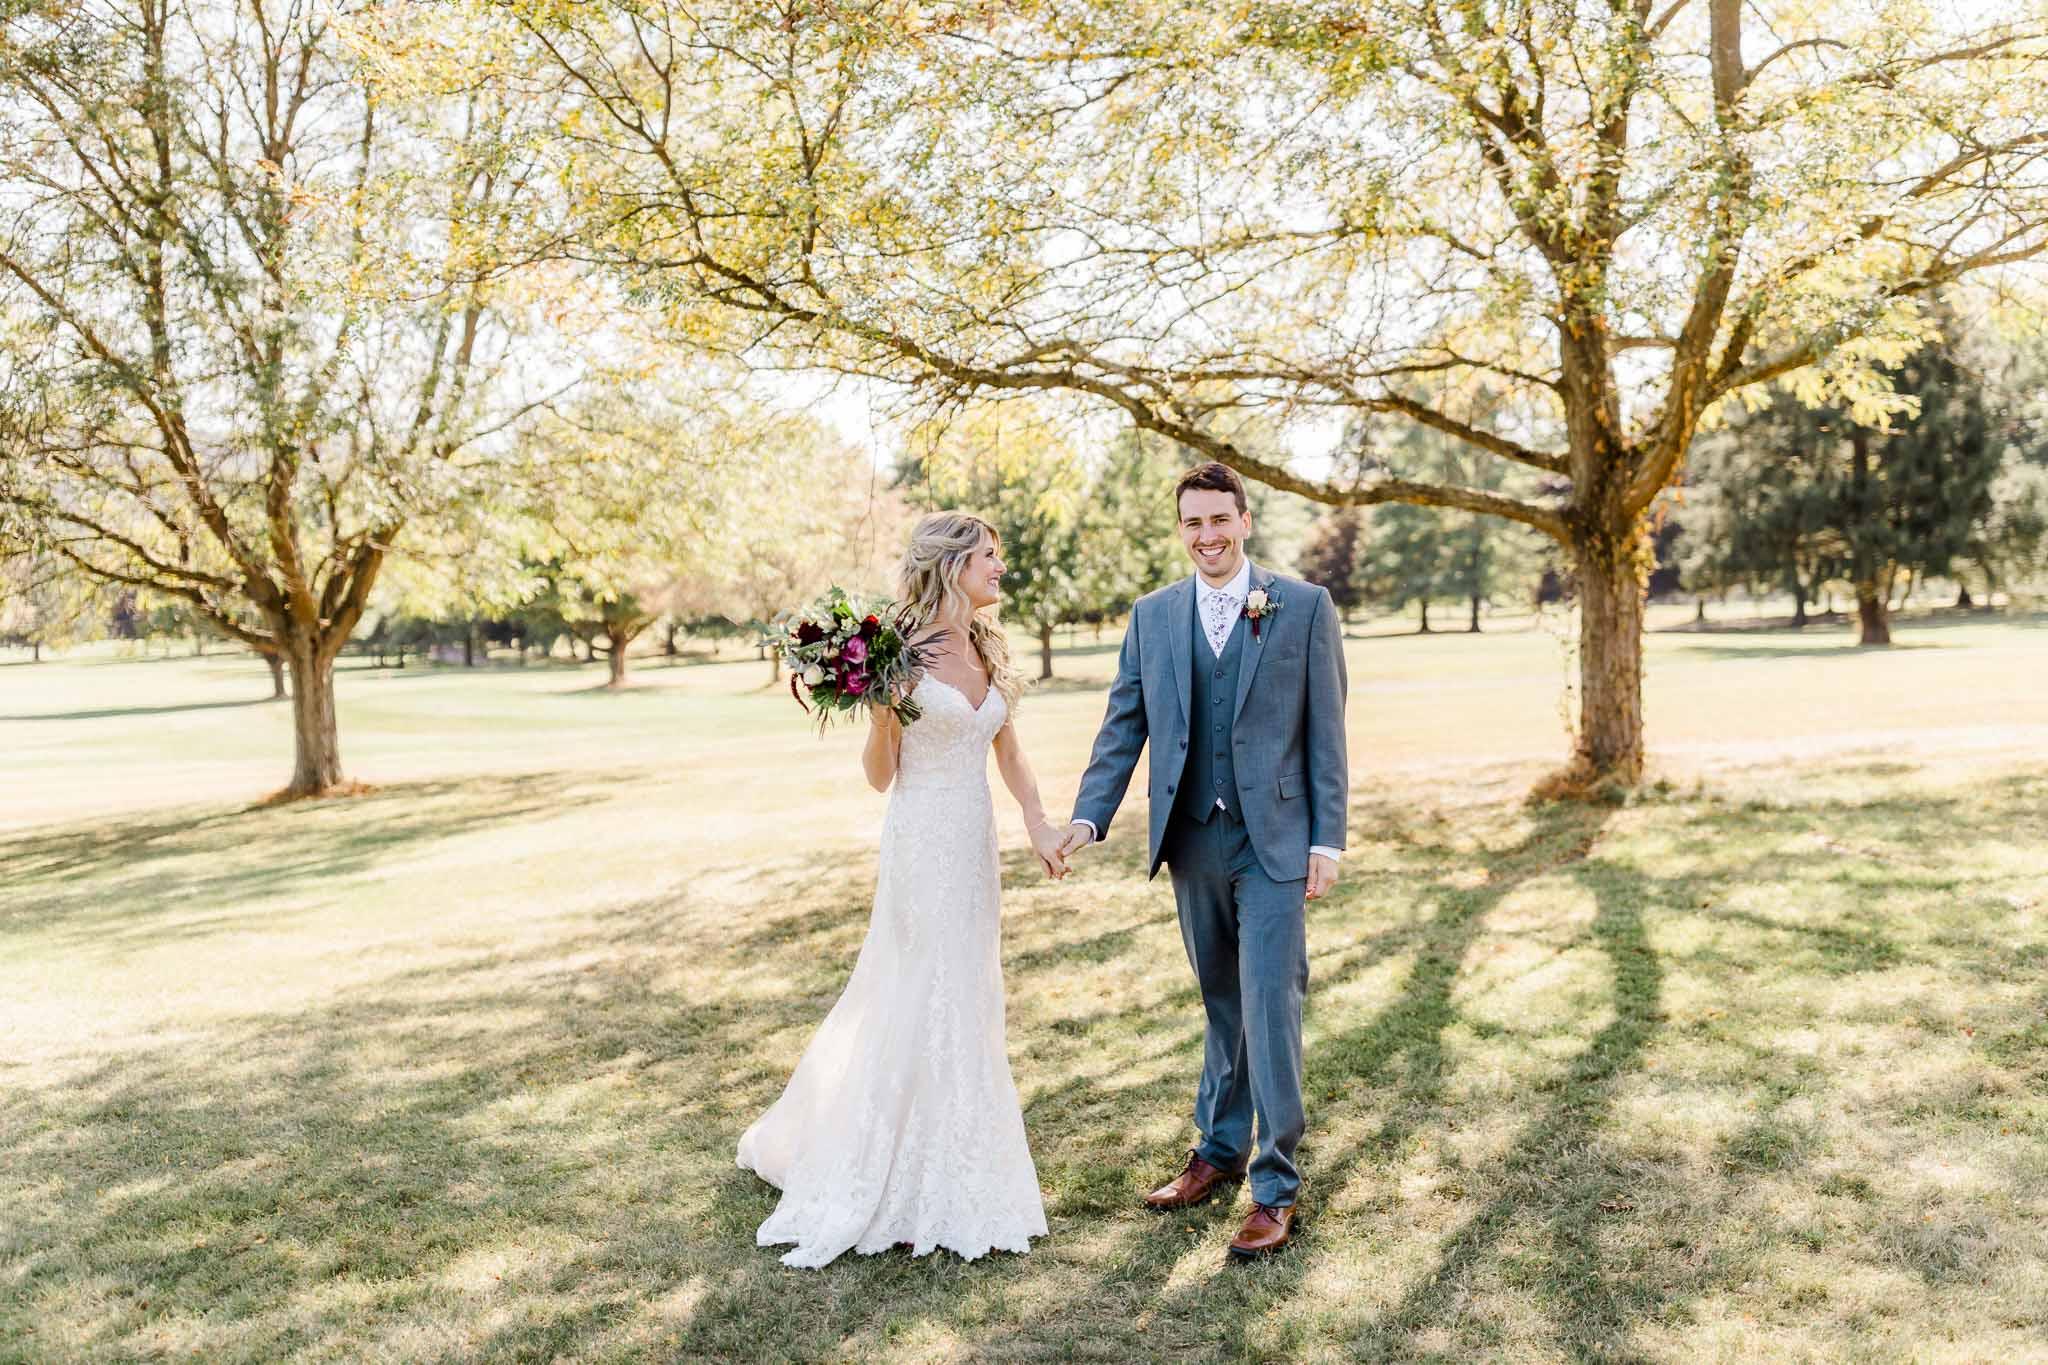 Frosty-Valley-September-Wedding-7653.jpg